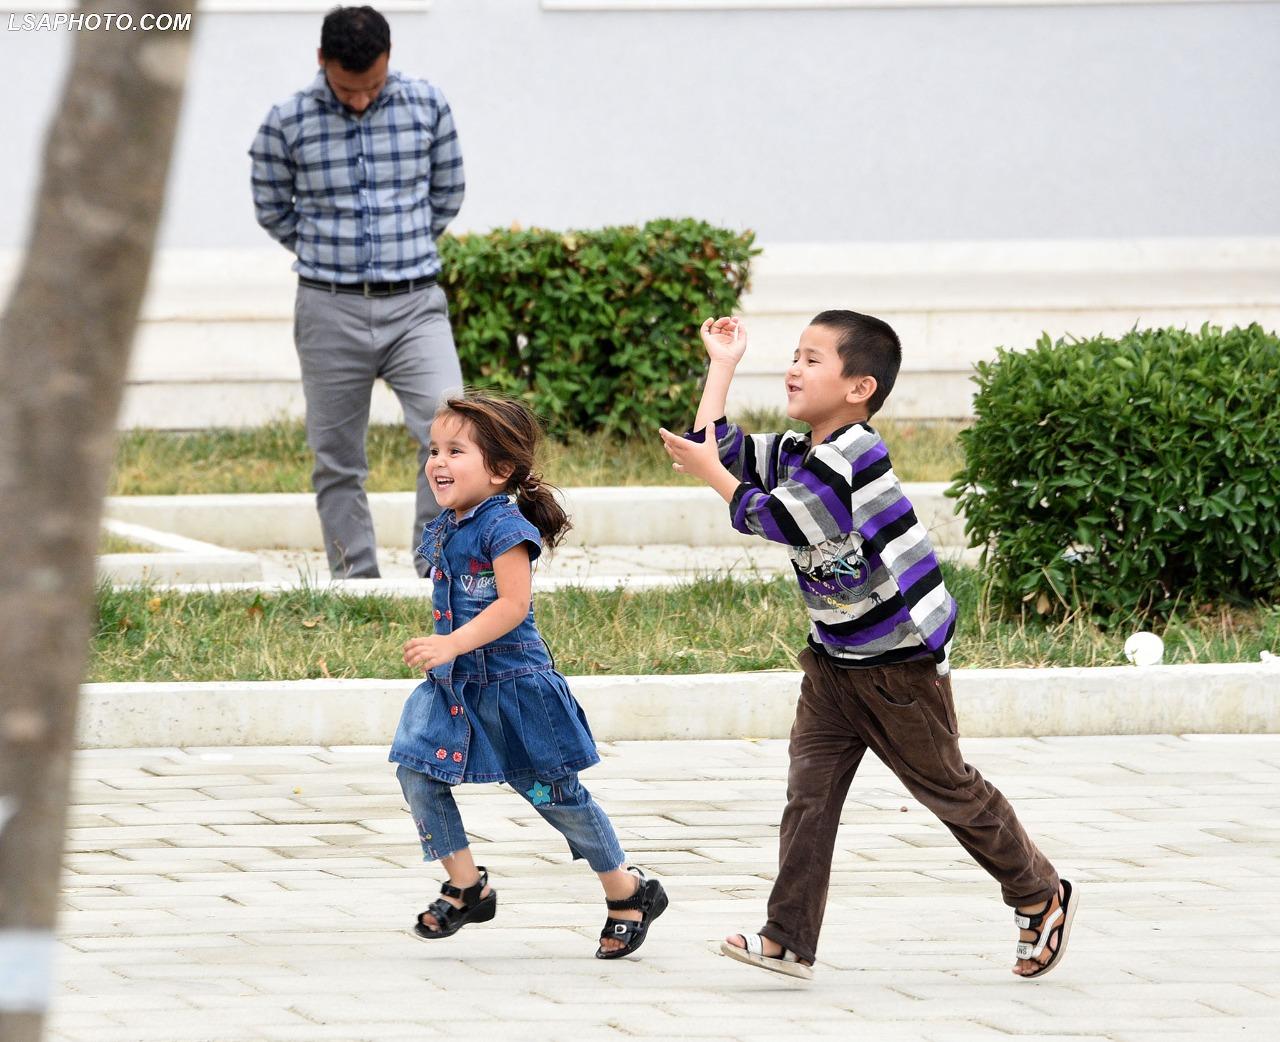 afganeqytetistudenti-16